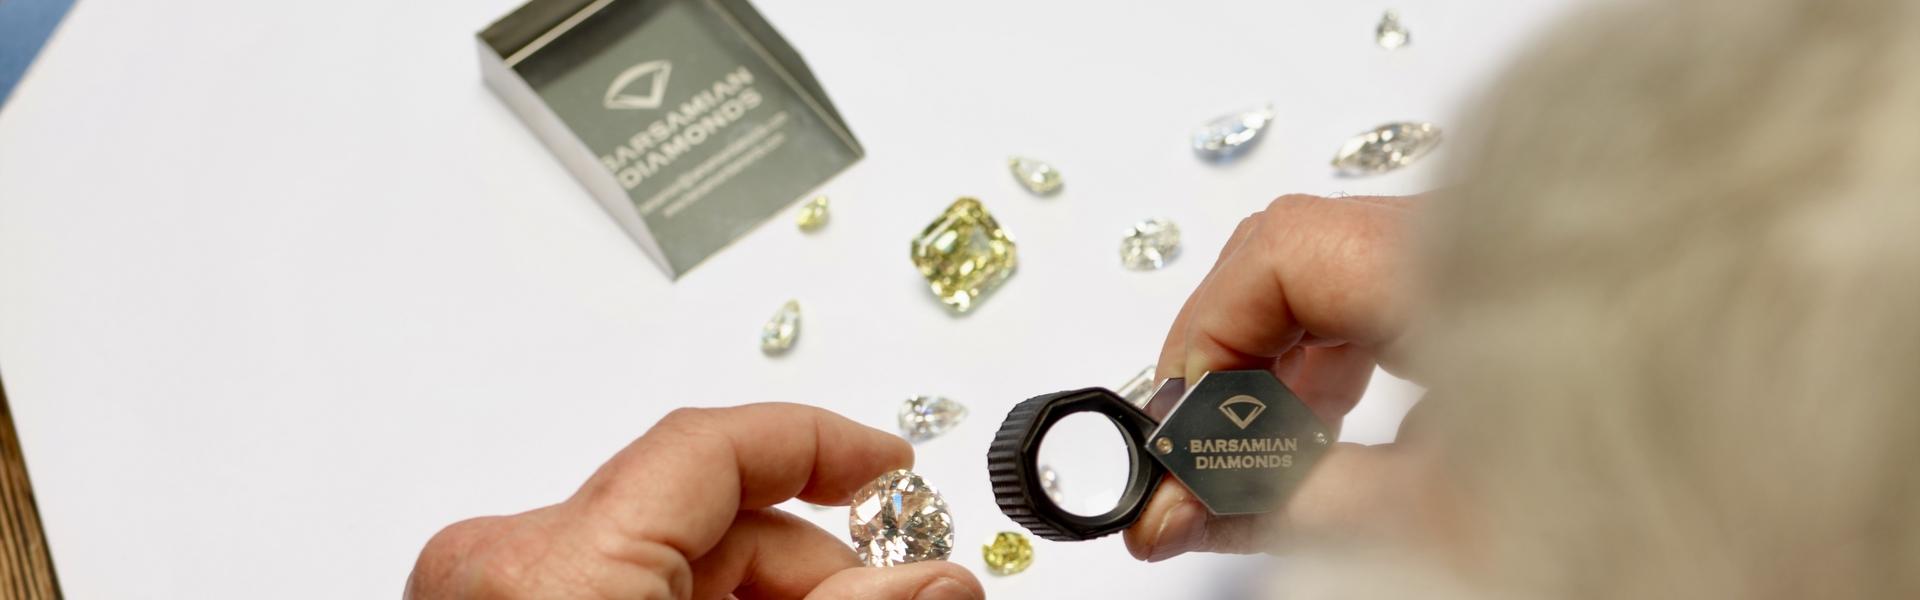 Barsamina Service Diamonds Back